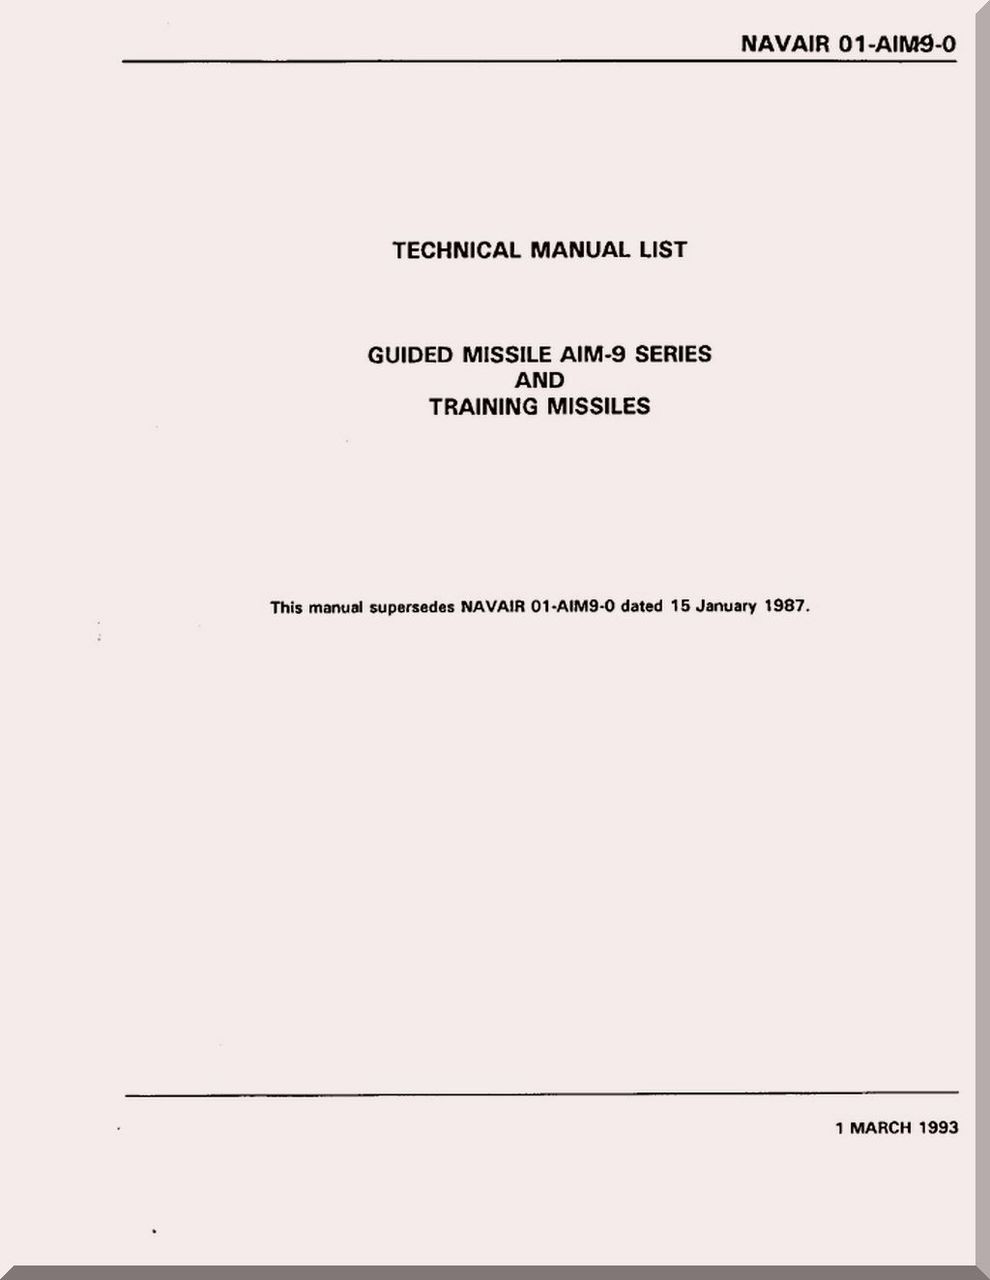 Navair 01 1a 23 manual navair 01 1a 23 manual array guide missile aim 9 series and training missile navair 01 aim9 0 rh aircraft fandeluxe Images